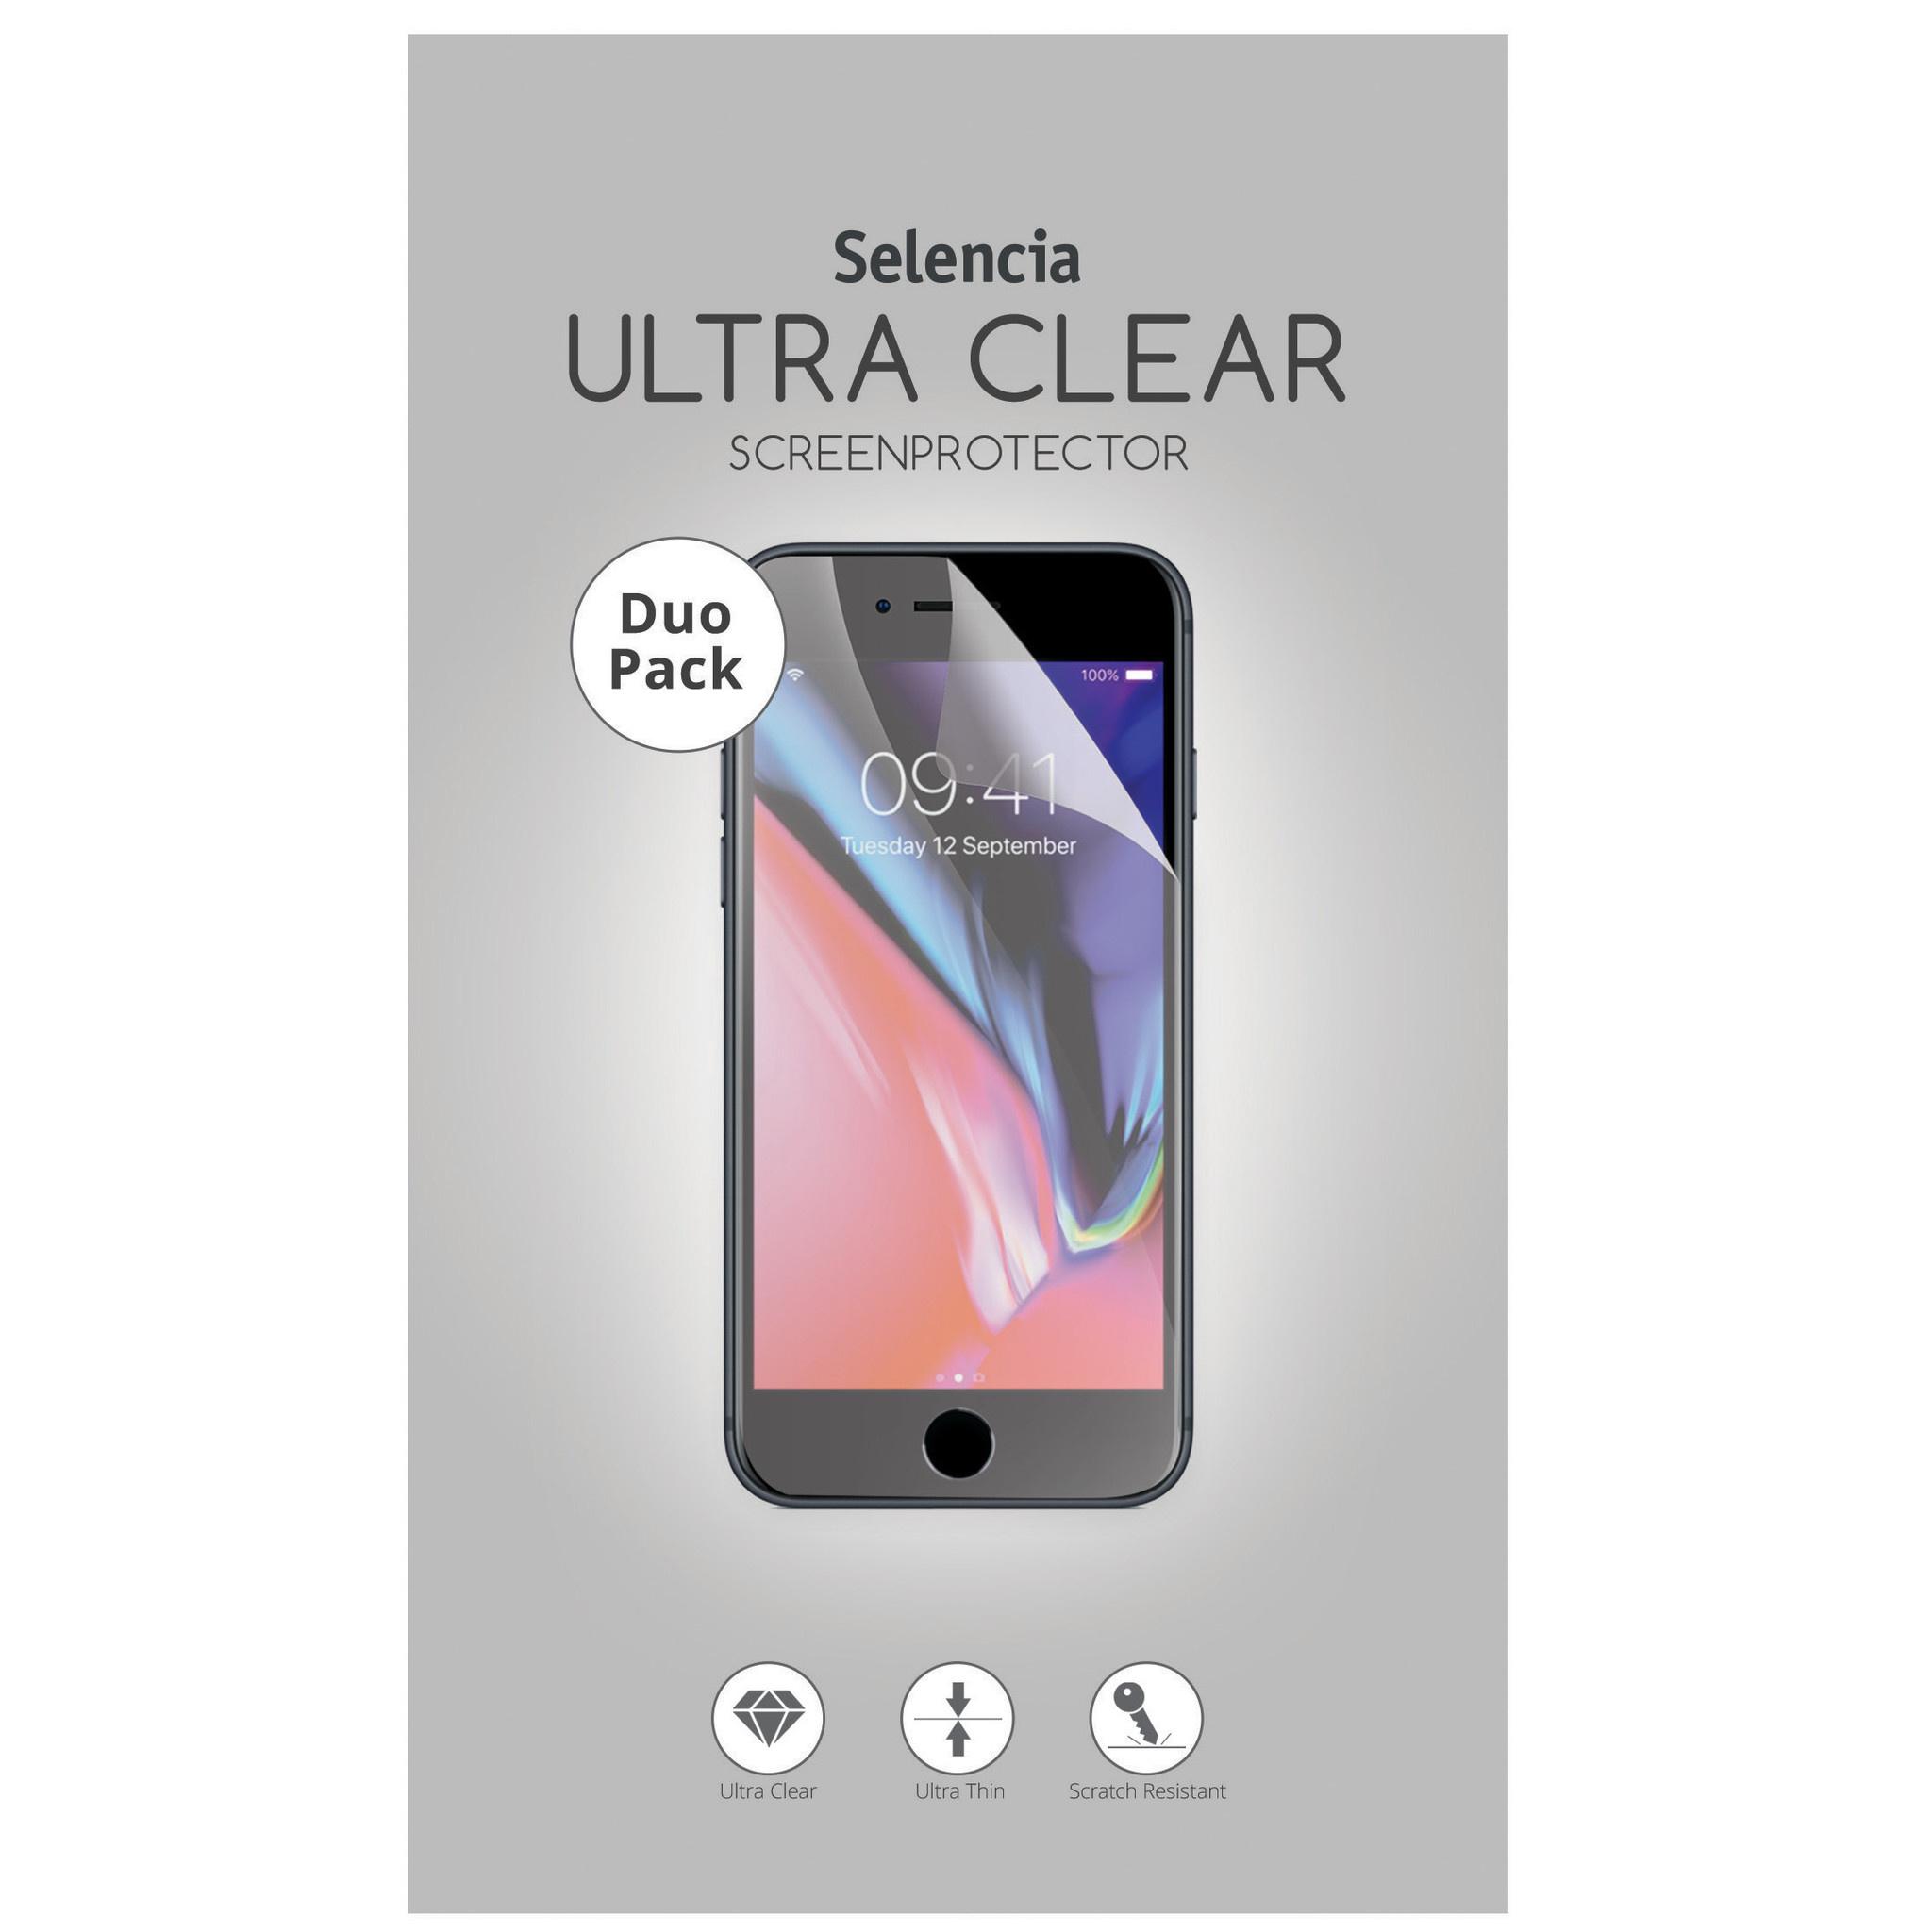 Selencia Duo Pack Screenprotector für das Samsung Galaxy A6 (2018)